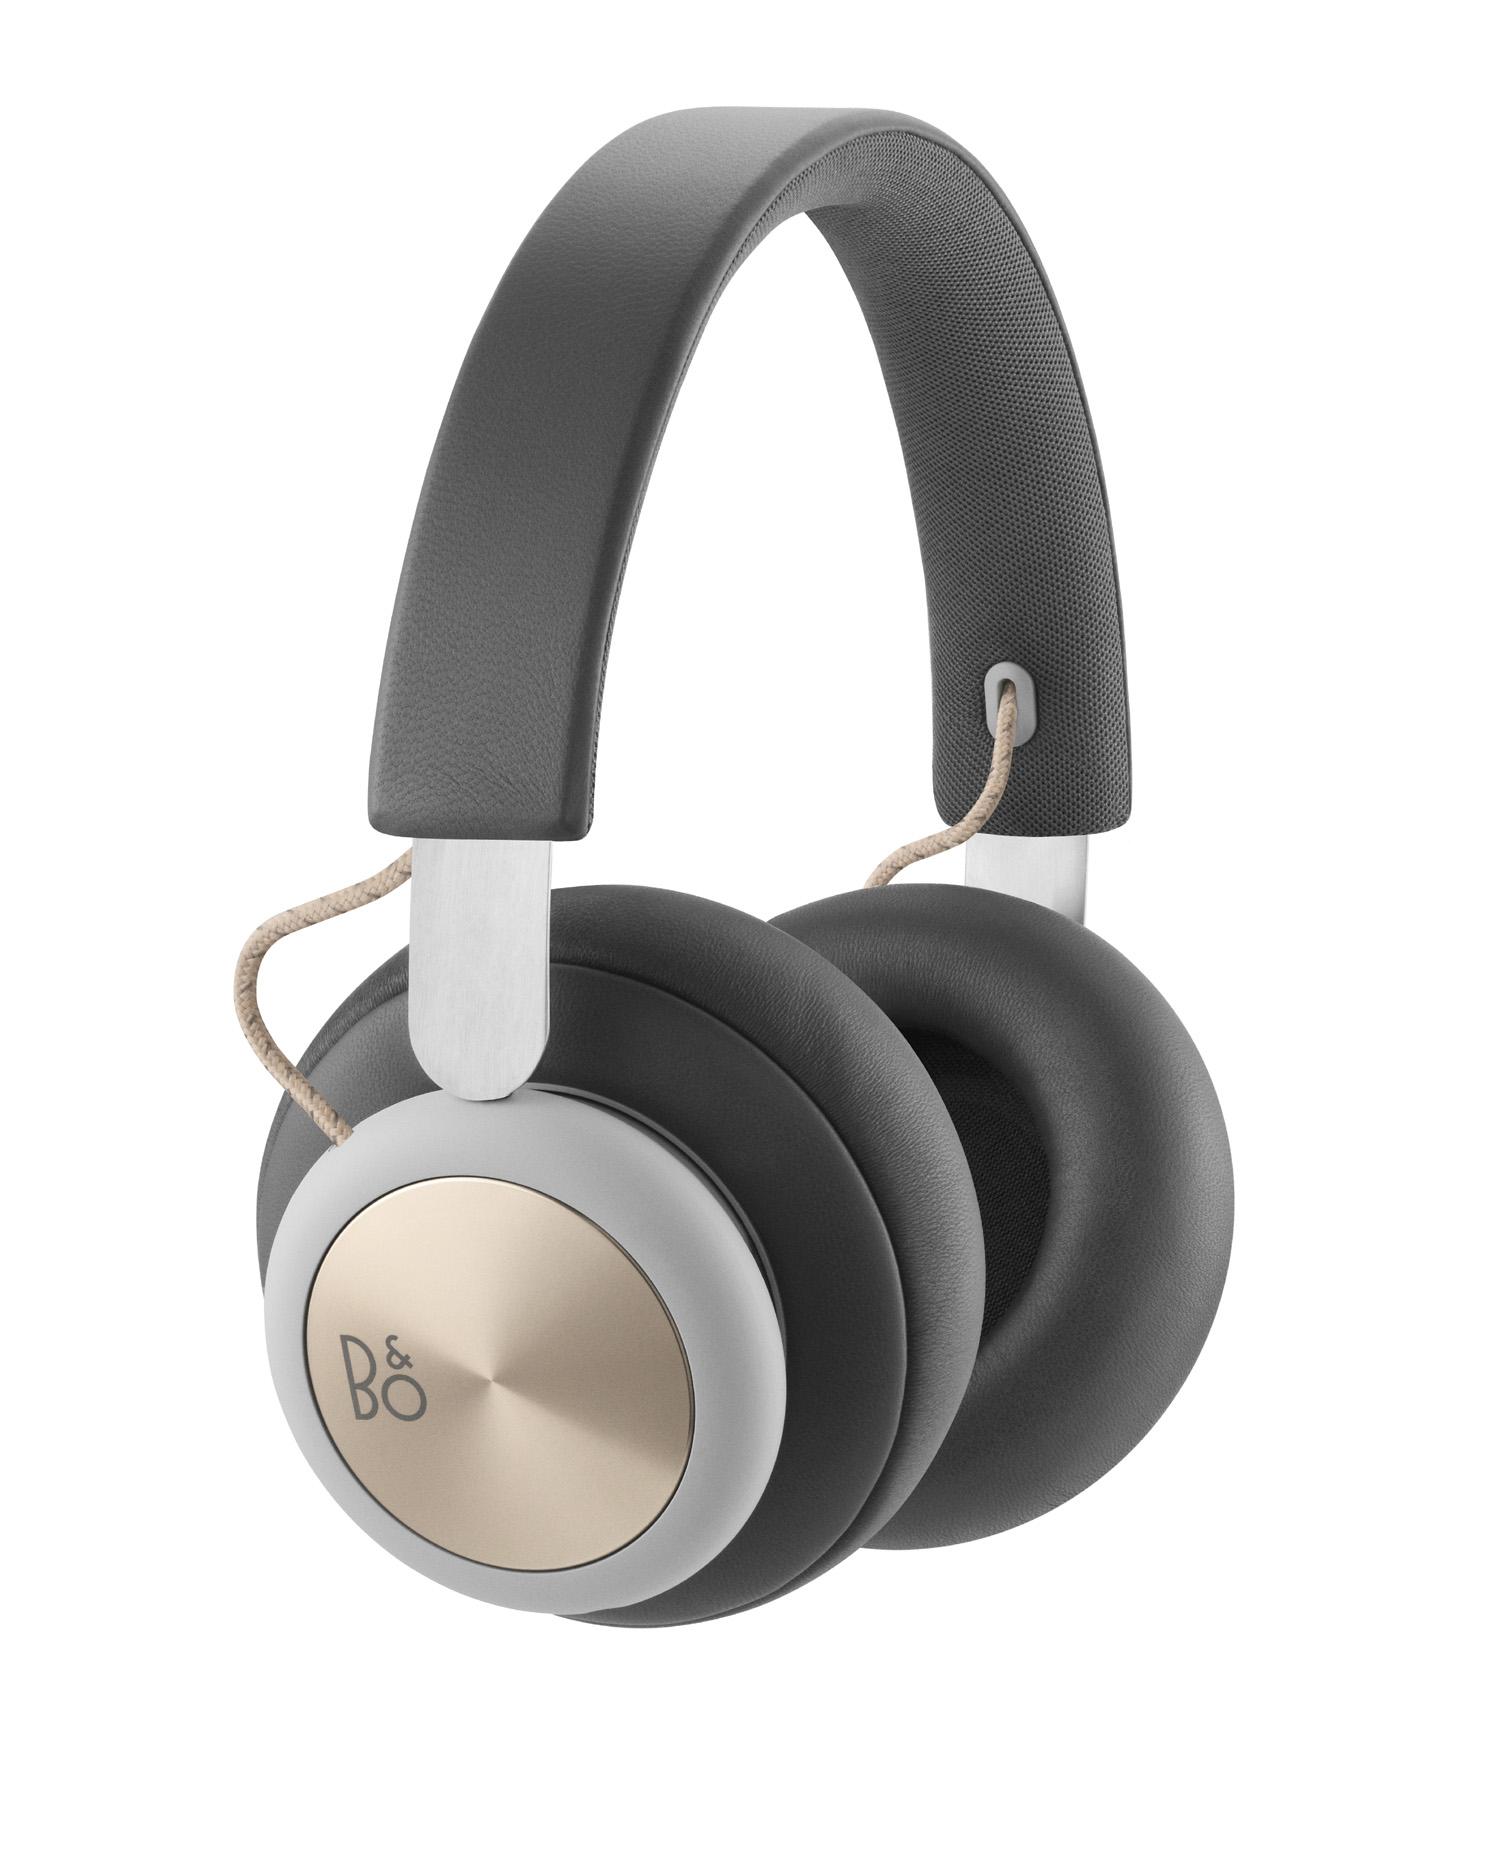 BEOPLAY H4 Wireless Headphones - PKR 40,000